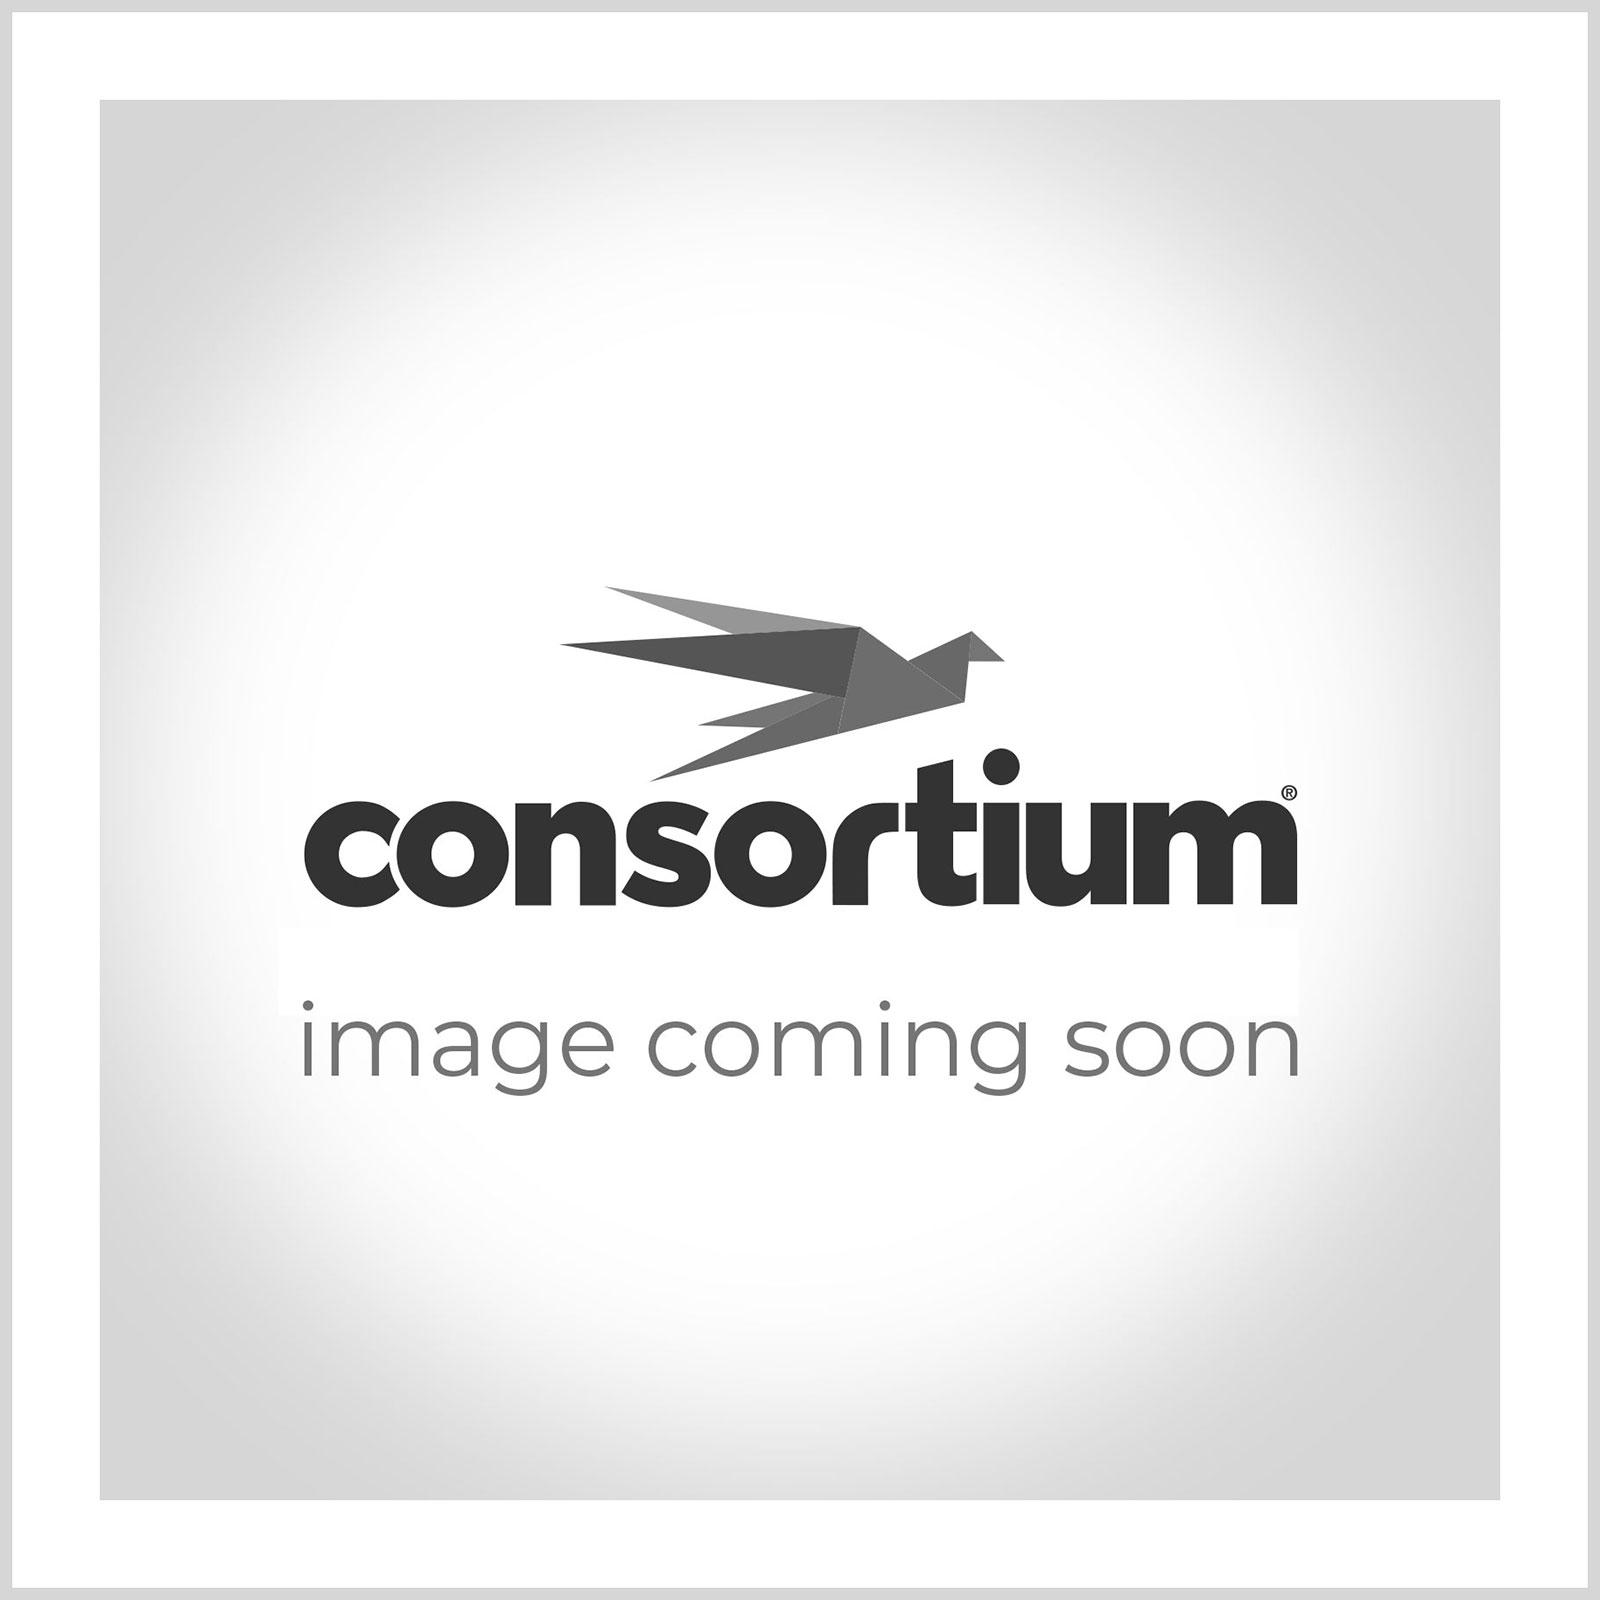 Consortium C-Fold Hand Towels